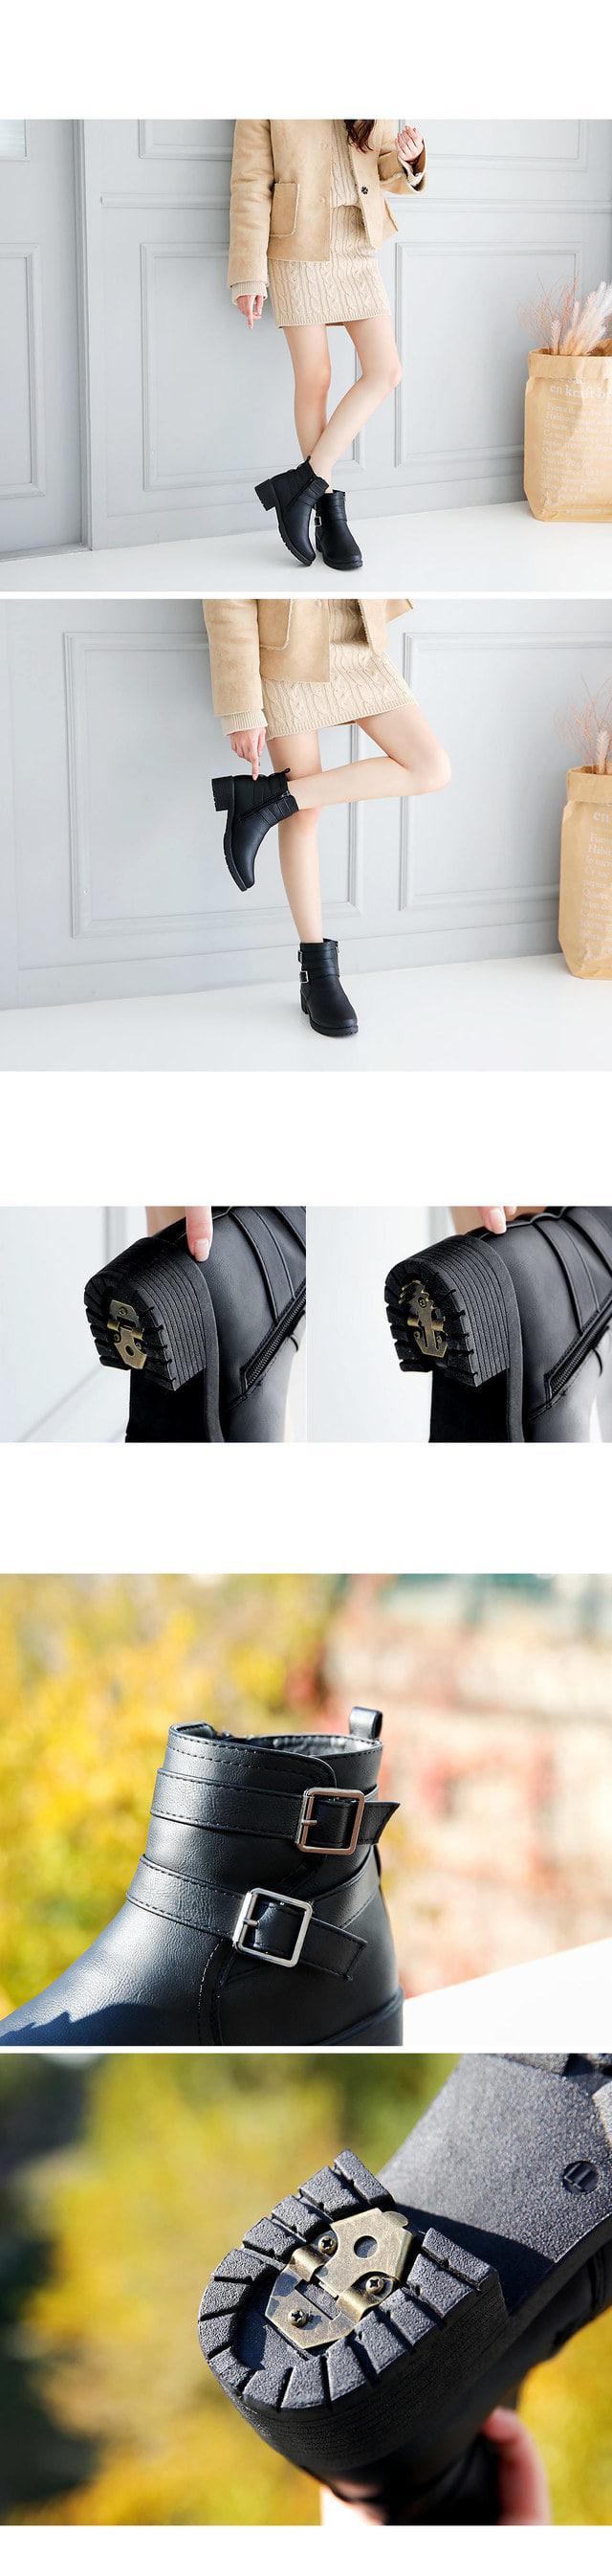 Zen High Ankle Boots 4.5cm